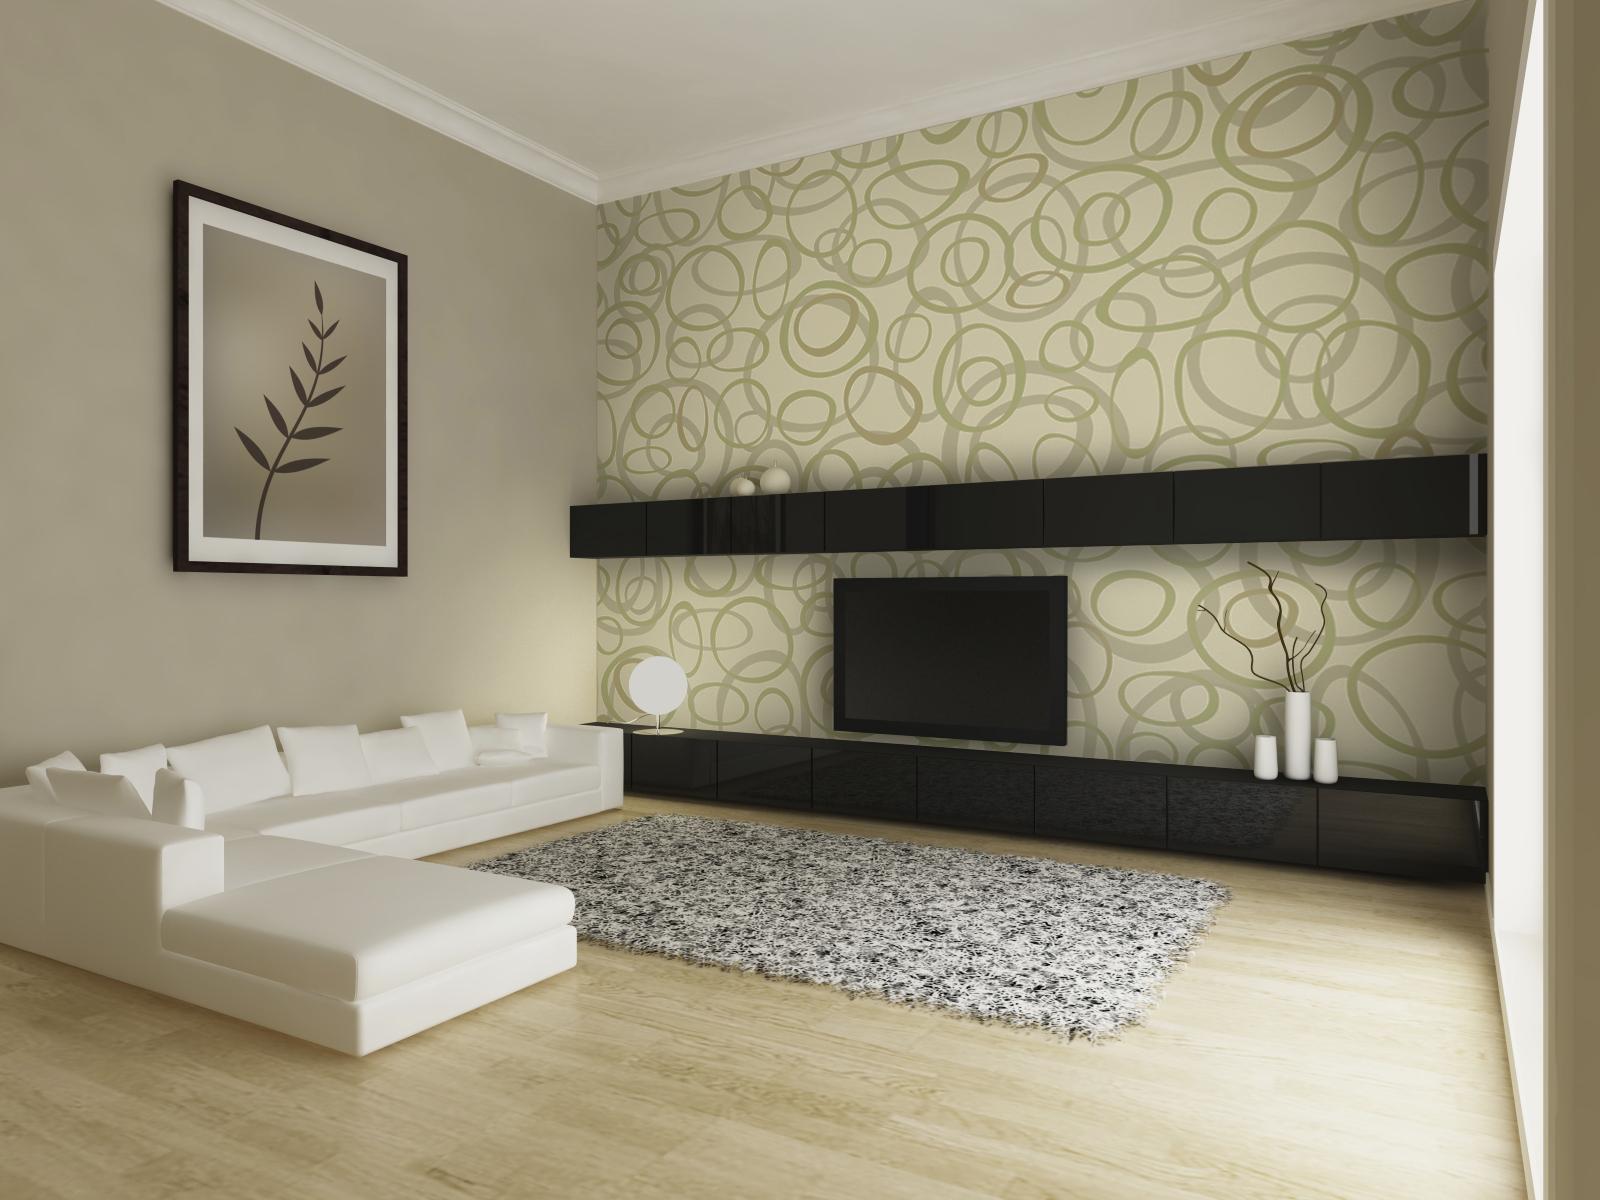 Wallpaper Interior Design 2017